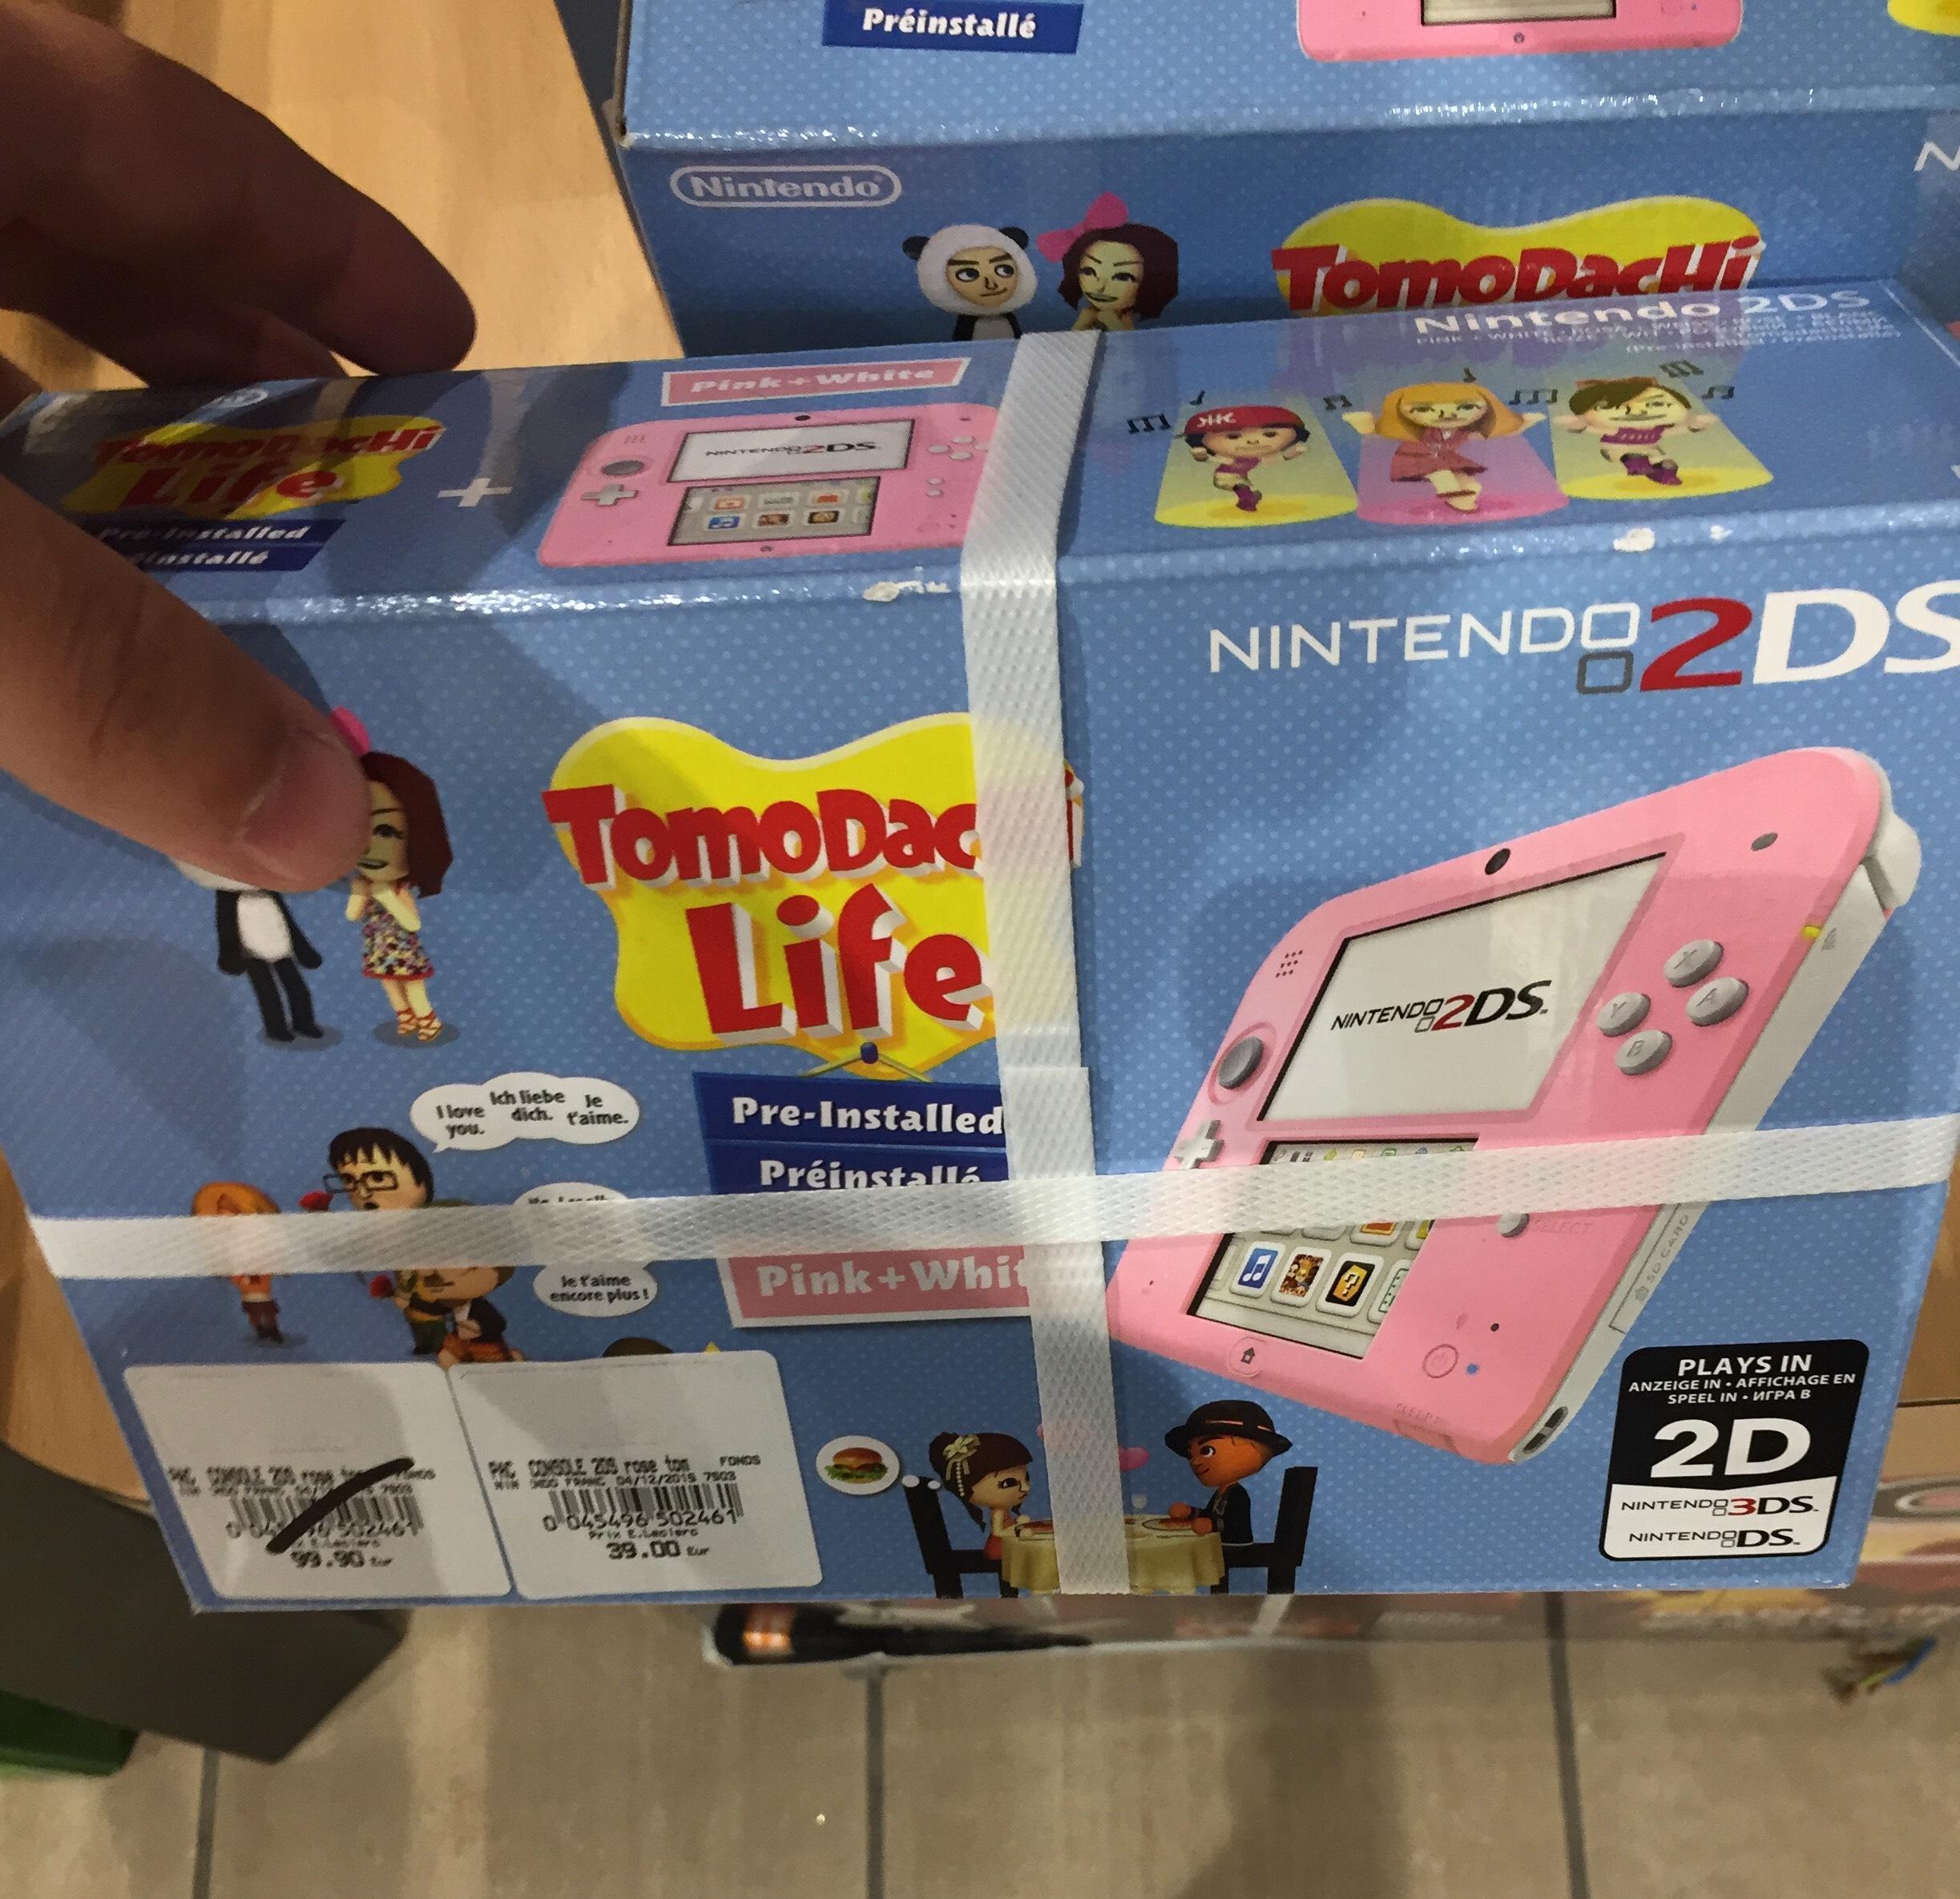 Console Nintendo 2DS Tomodachi